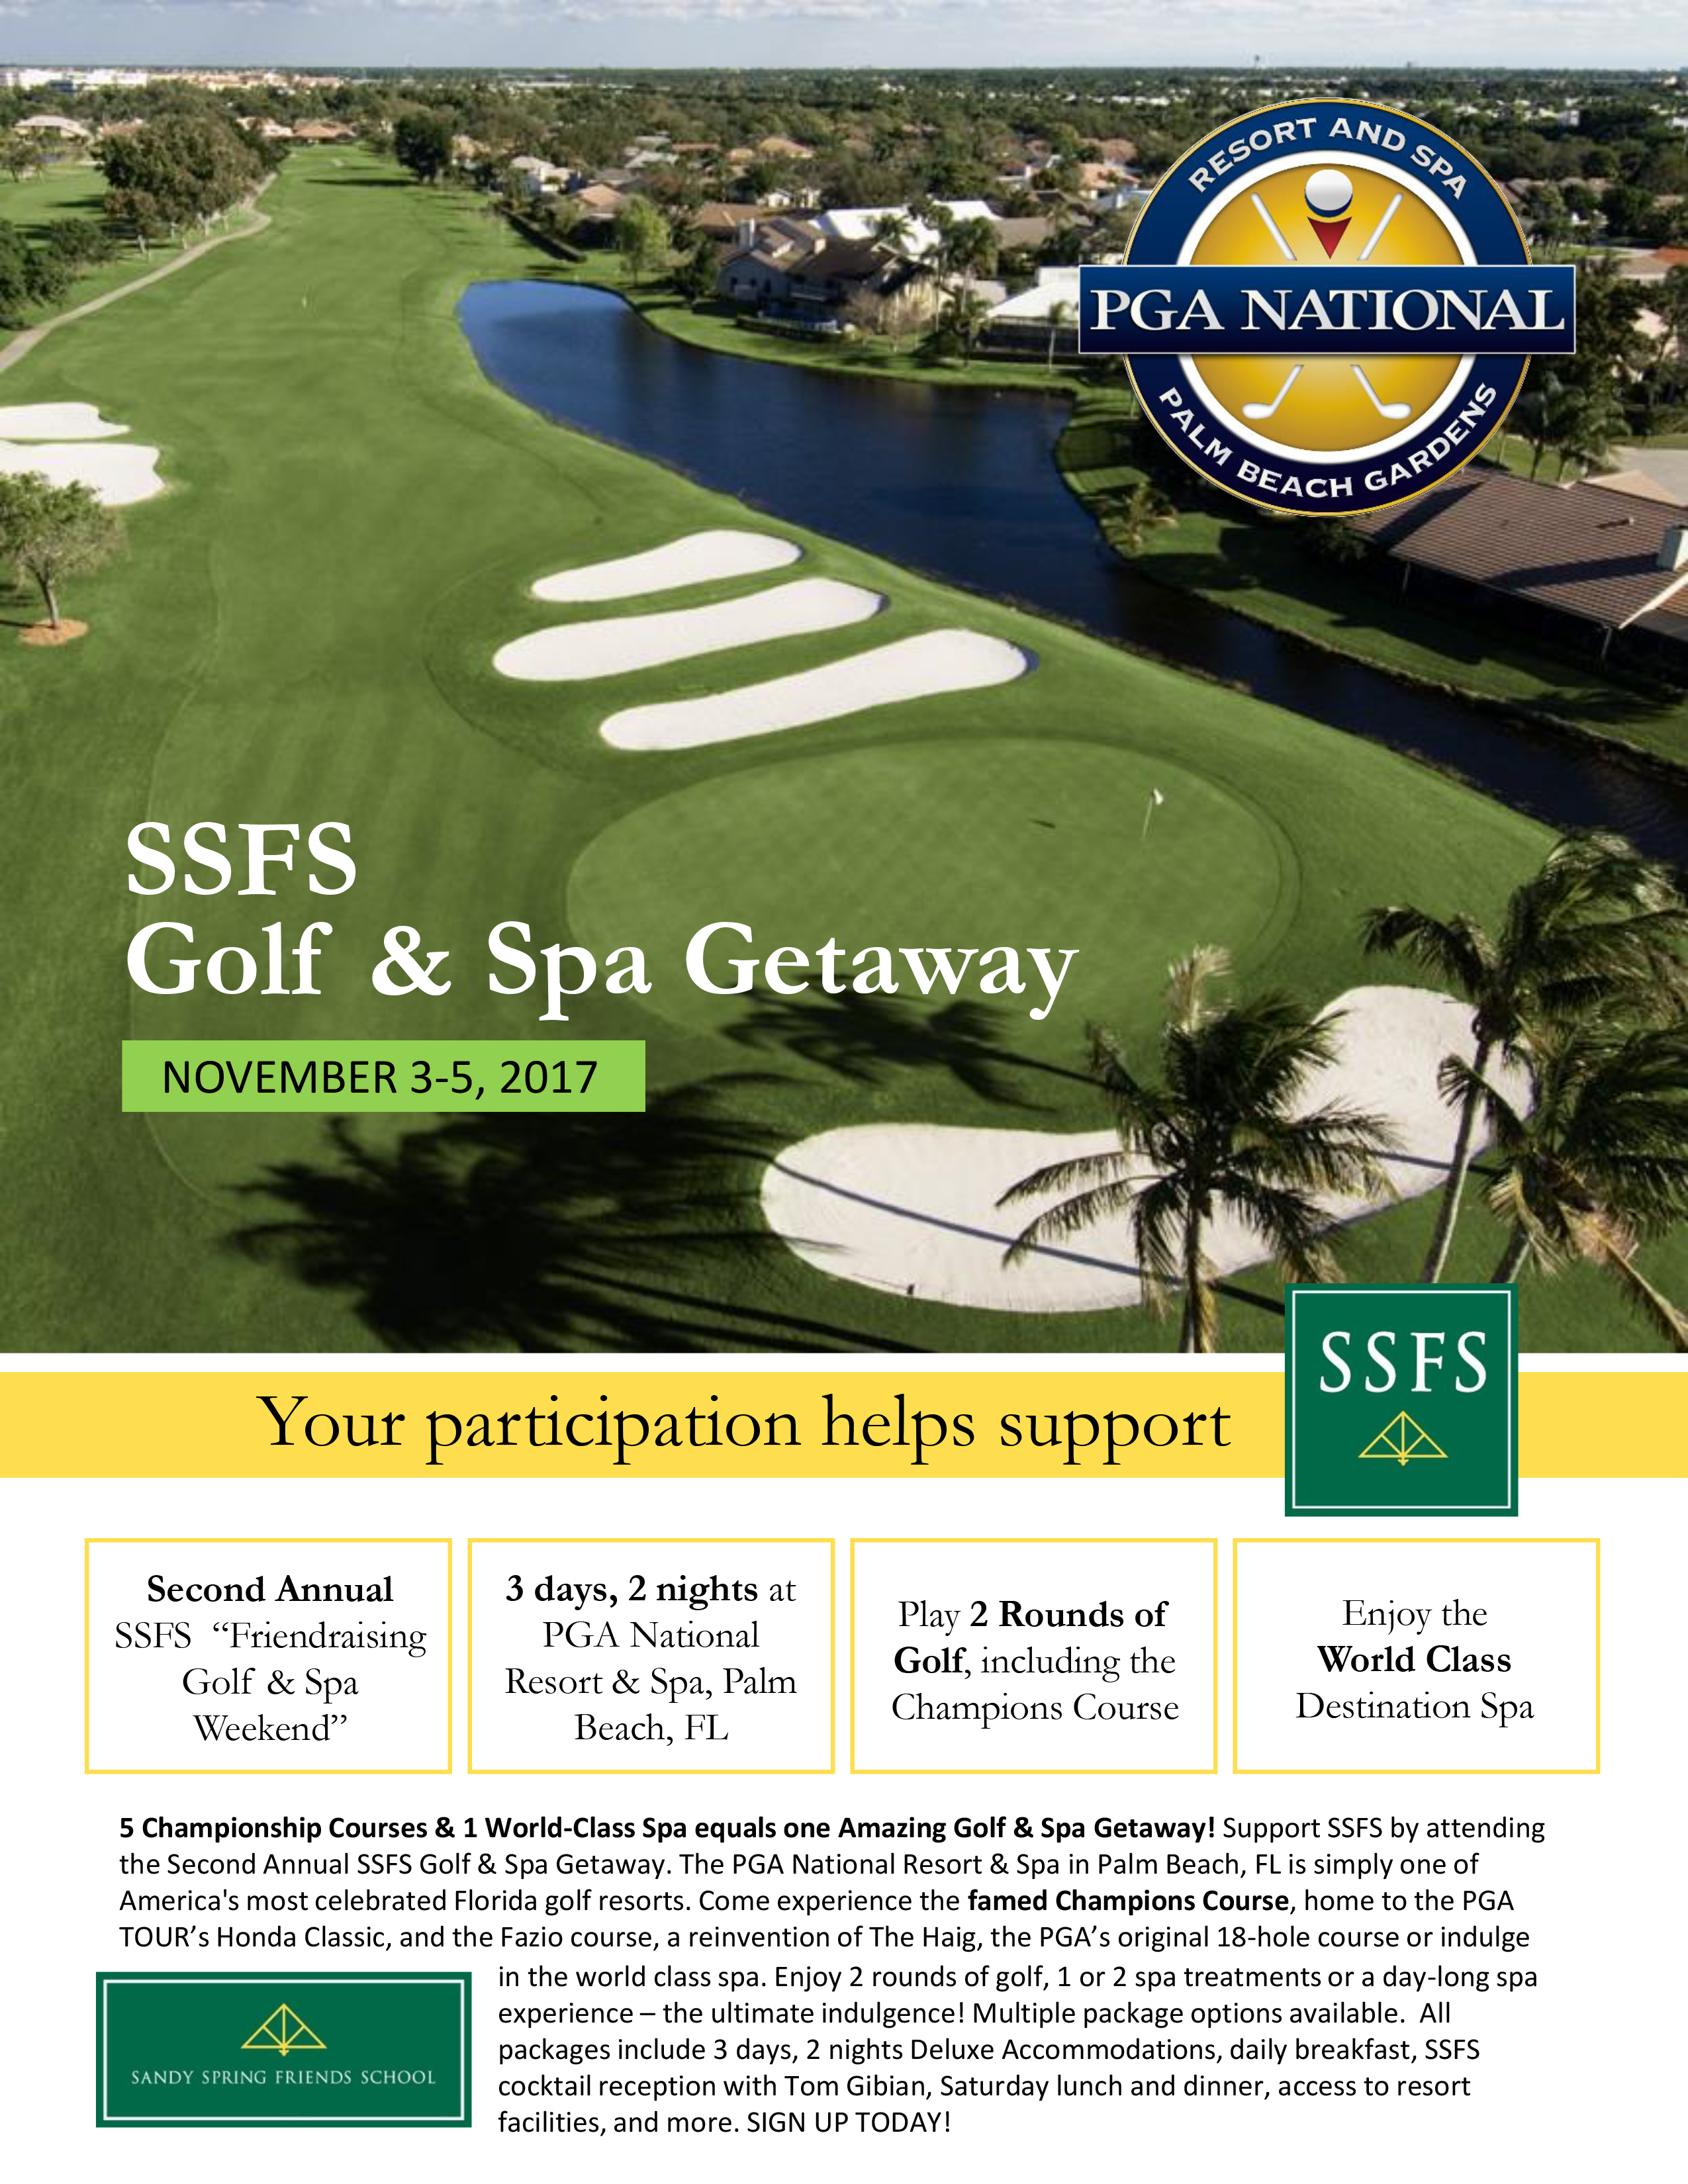 Golf & Spa Getaway - SSFS